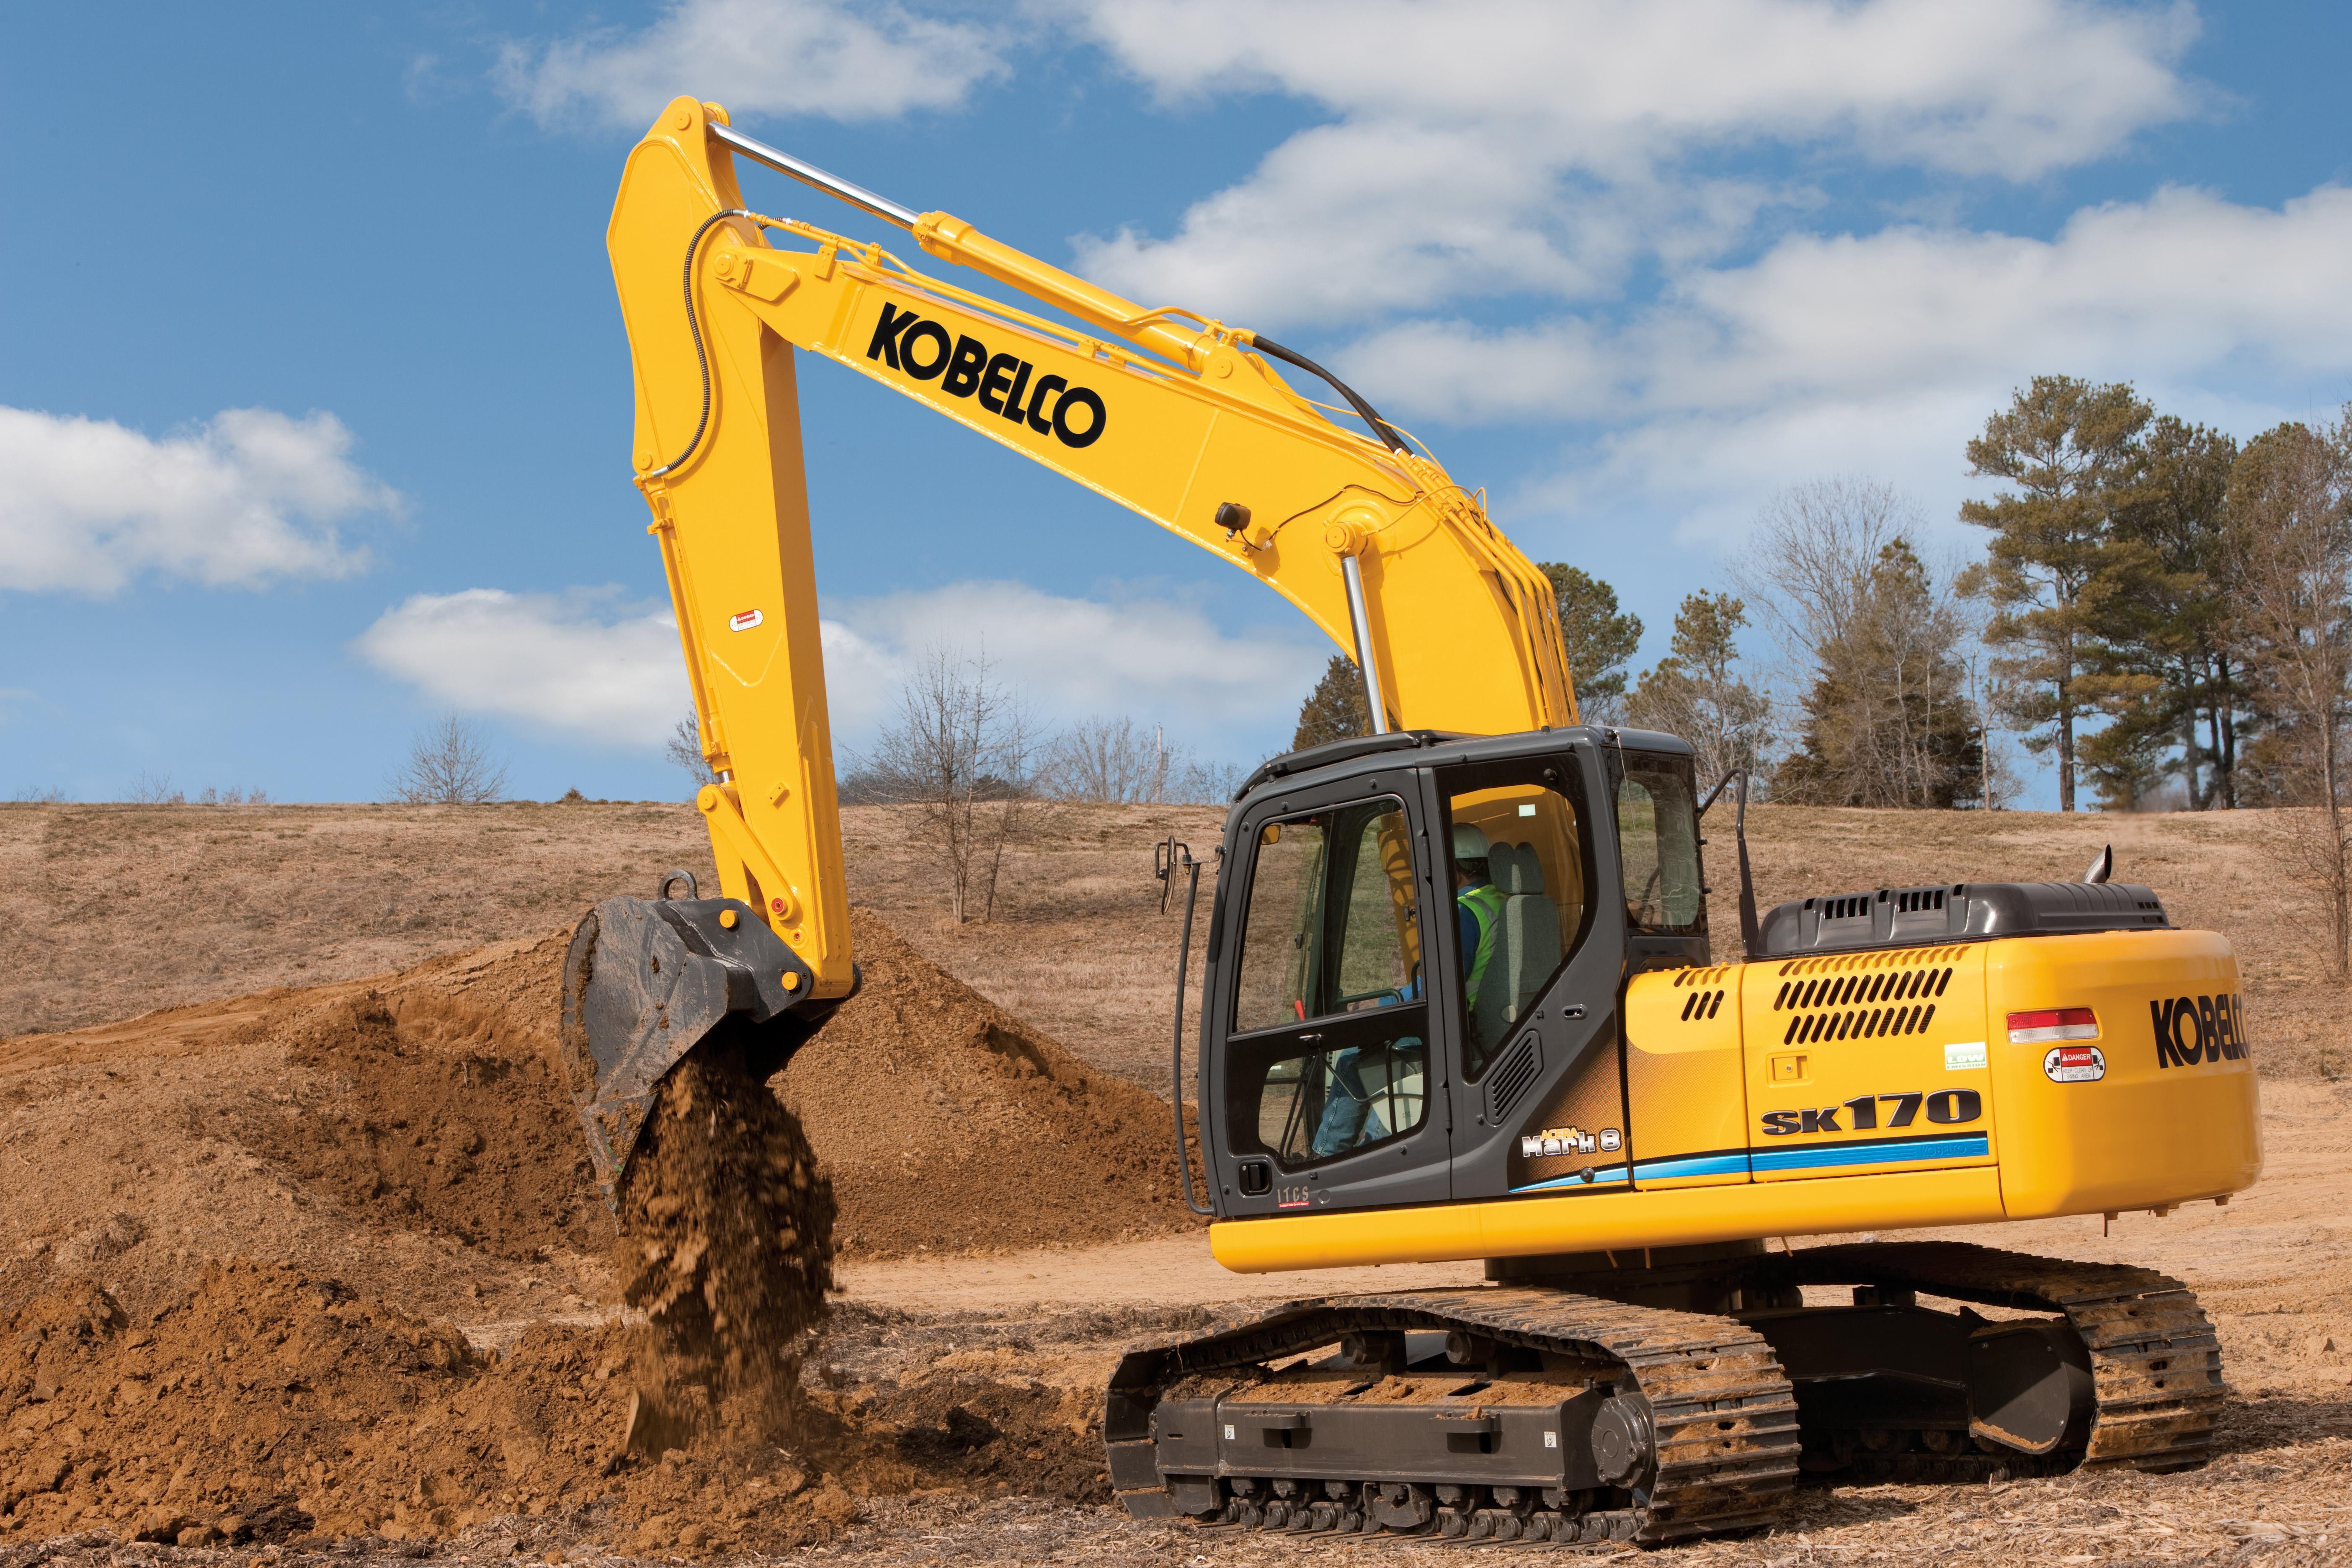 Kobelco Sk170 Mark 9 Excavator Concrete Construction